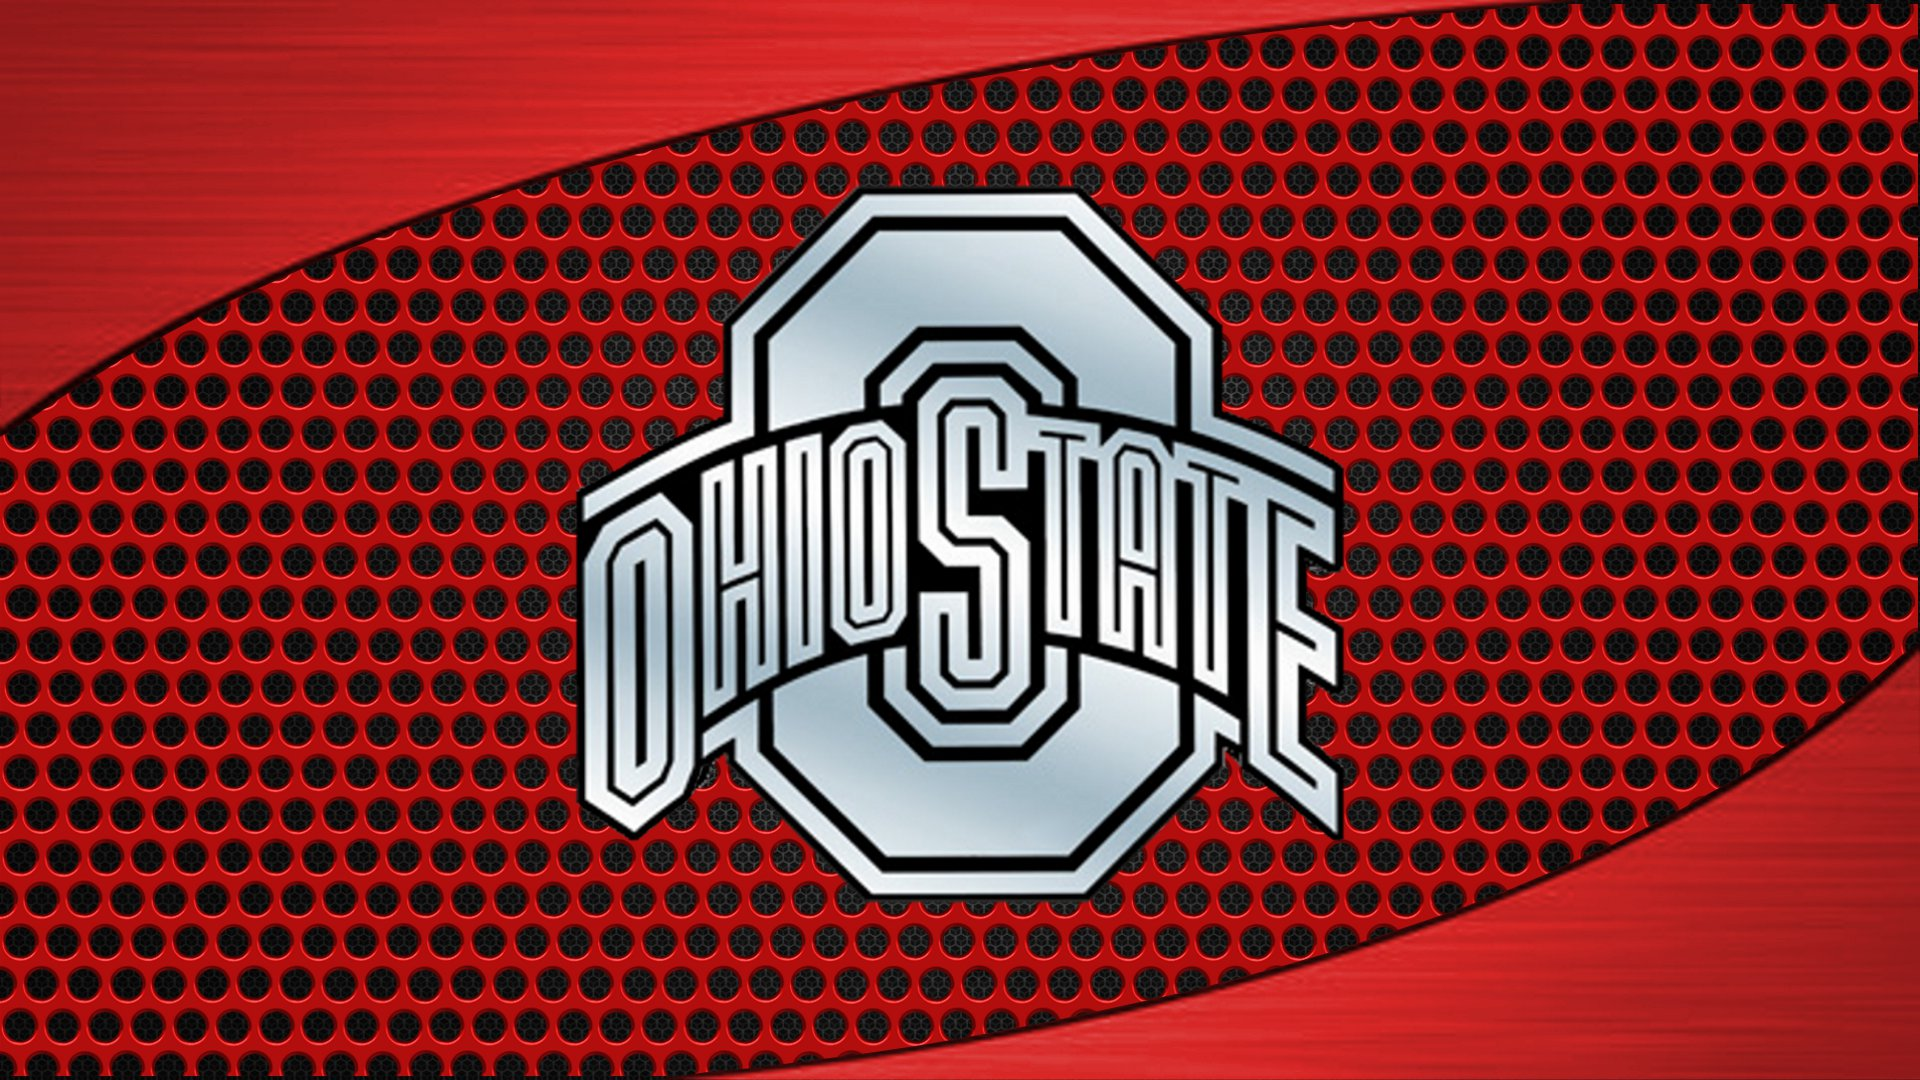 OSU Wallpaper 333 - Ohio State Football Wallpaper (29289012) - Fanpop